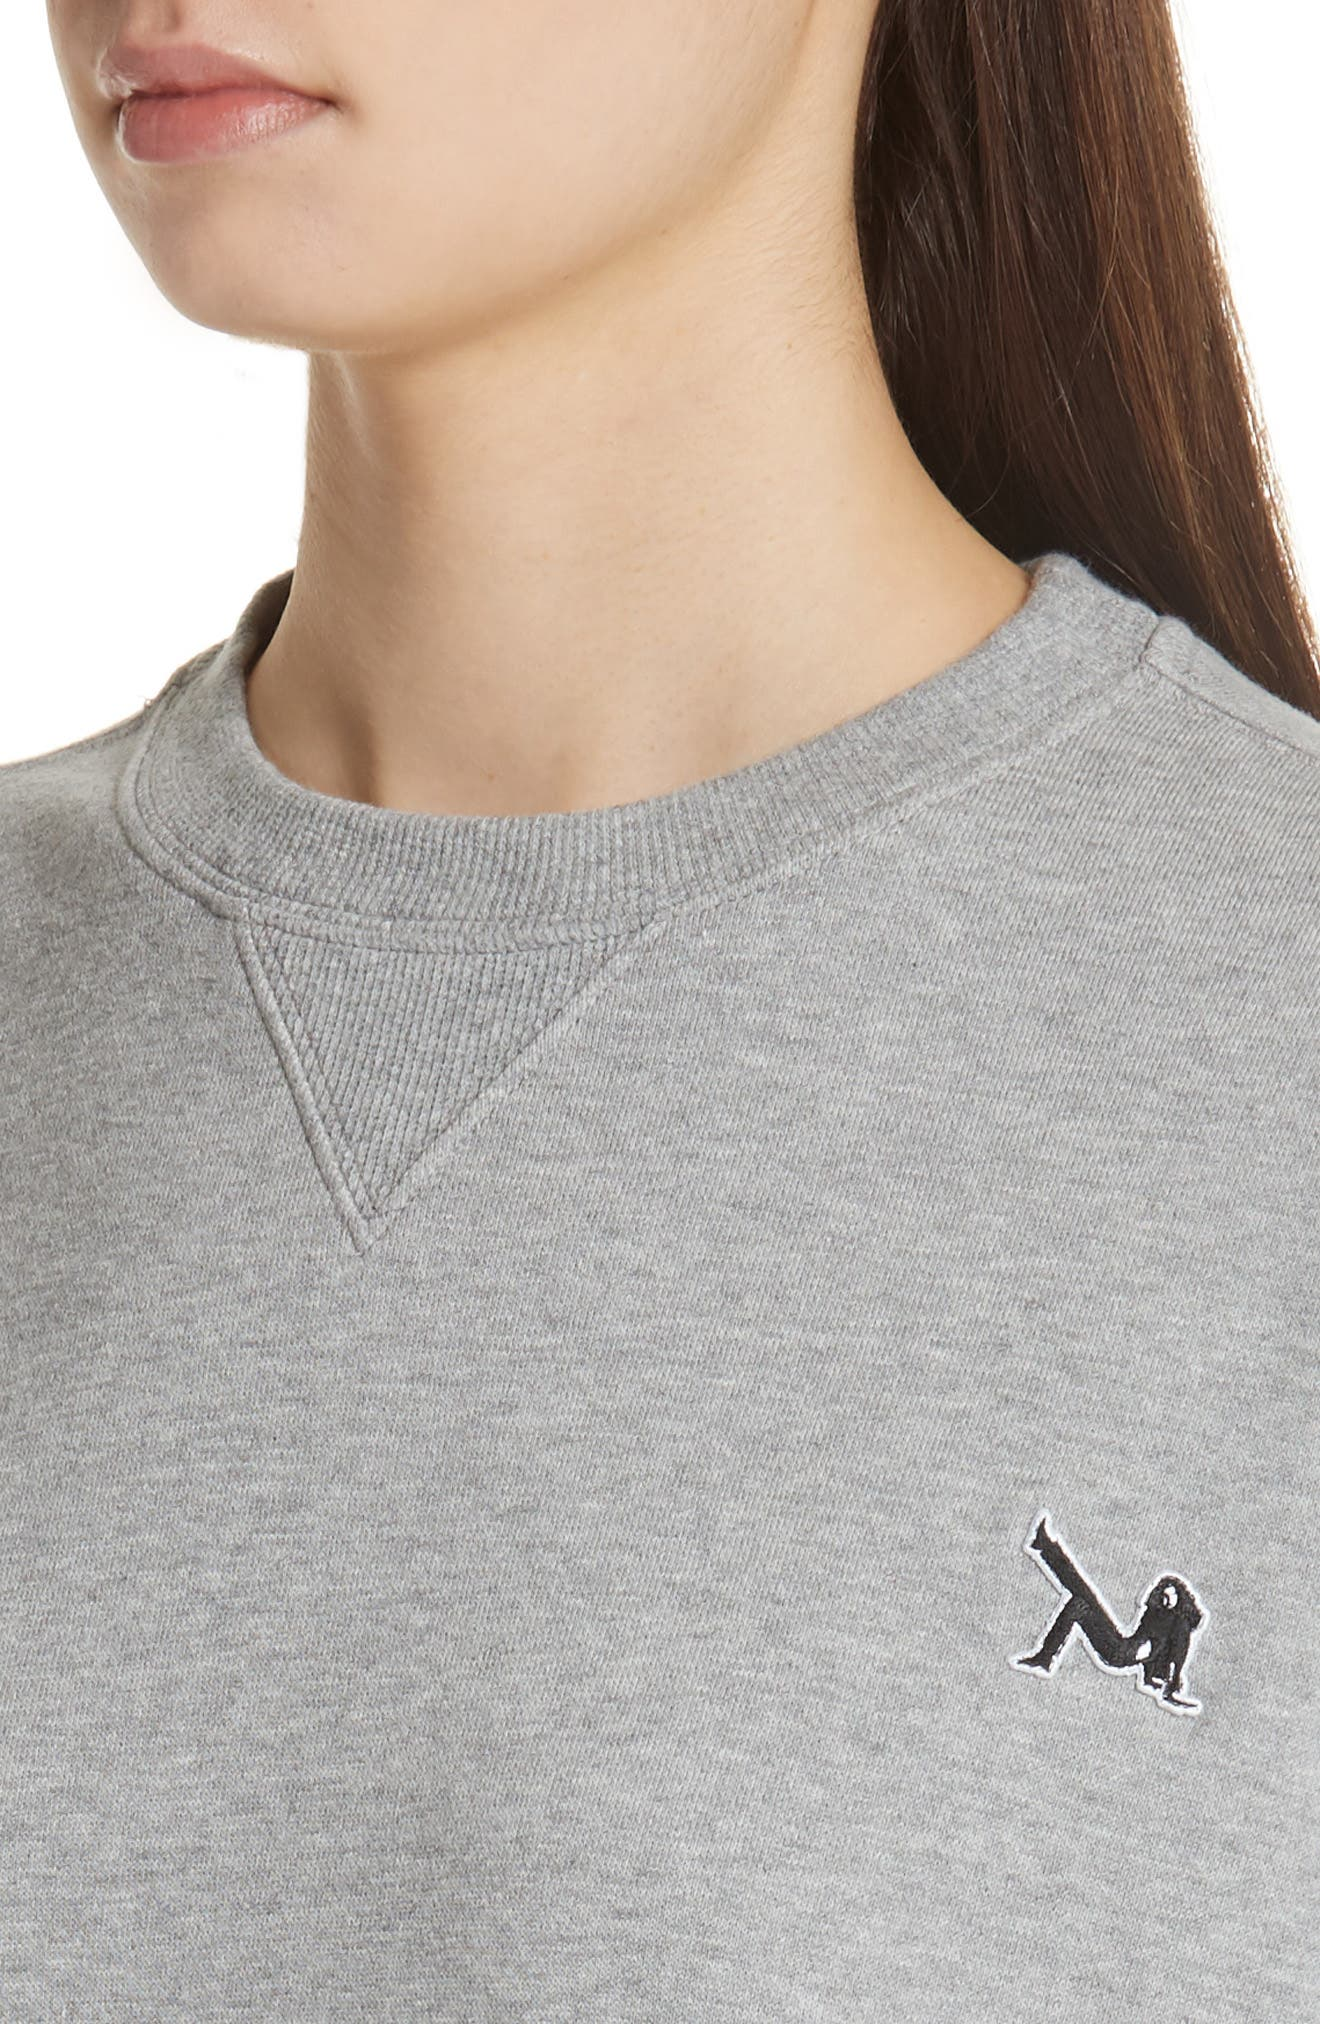 Brooke Shields Patch Sweatshirt,                             Alternate thumbnail 4, color,                             Grey